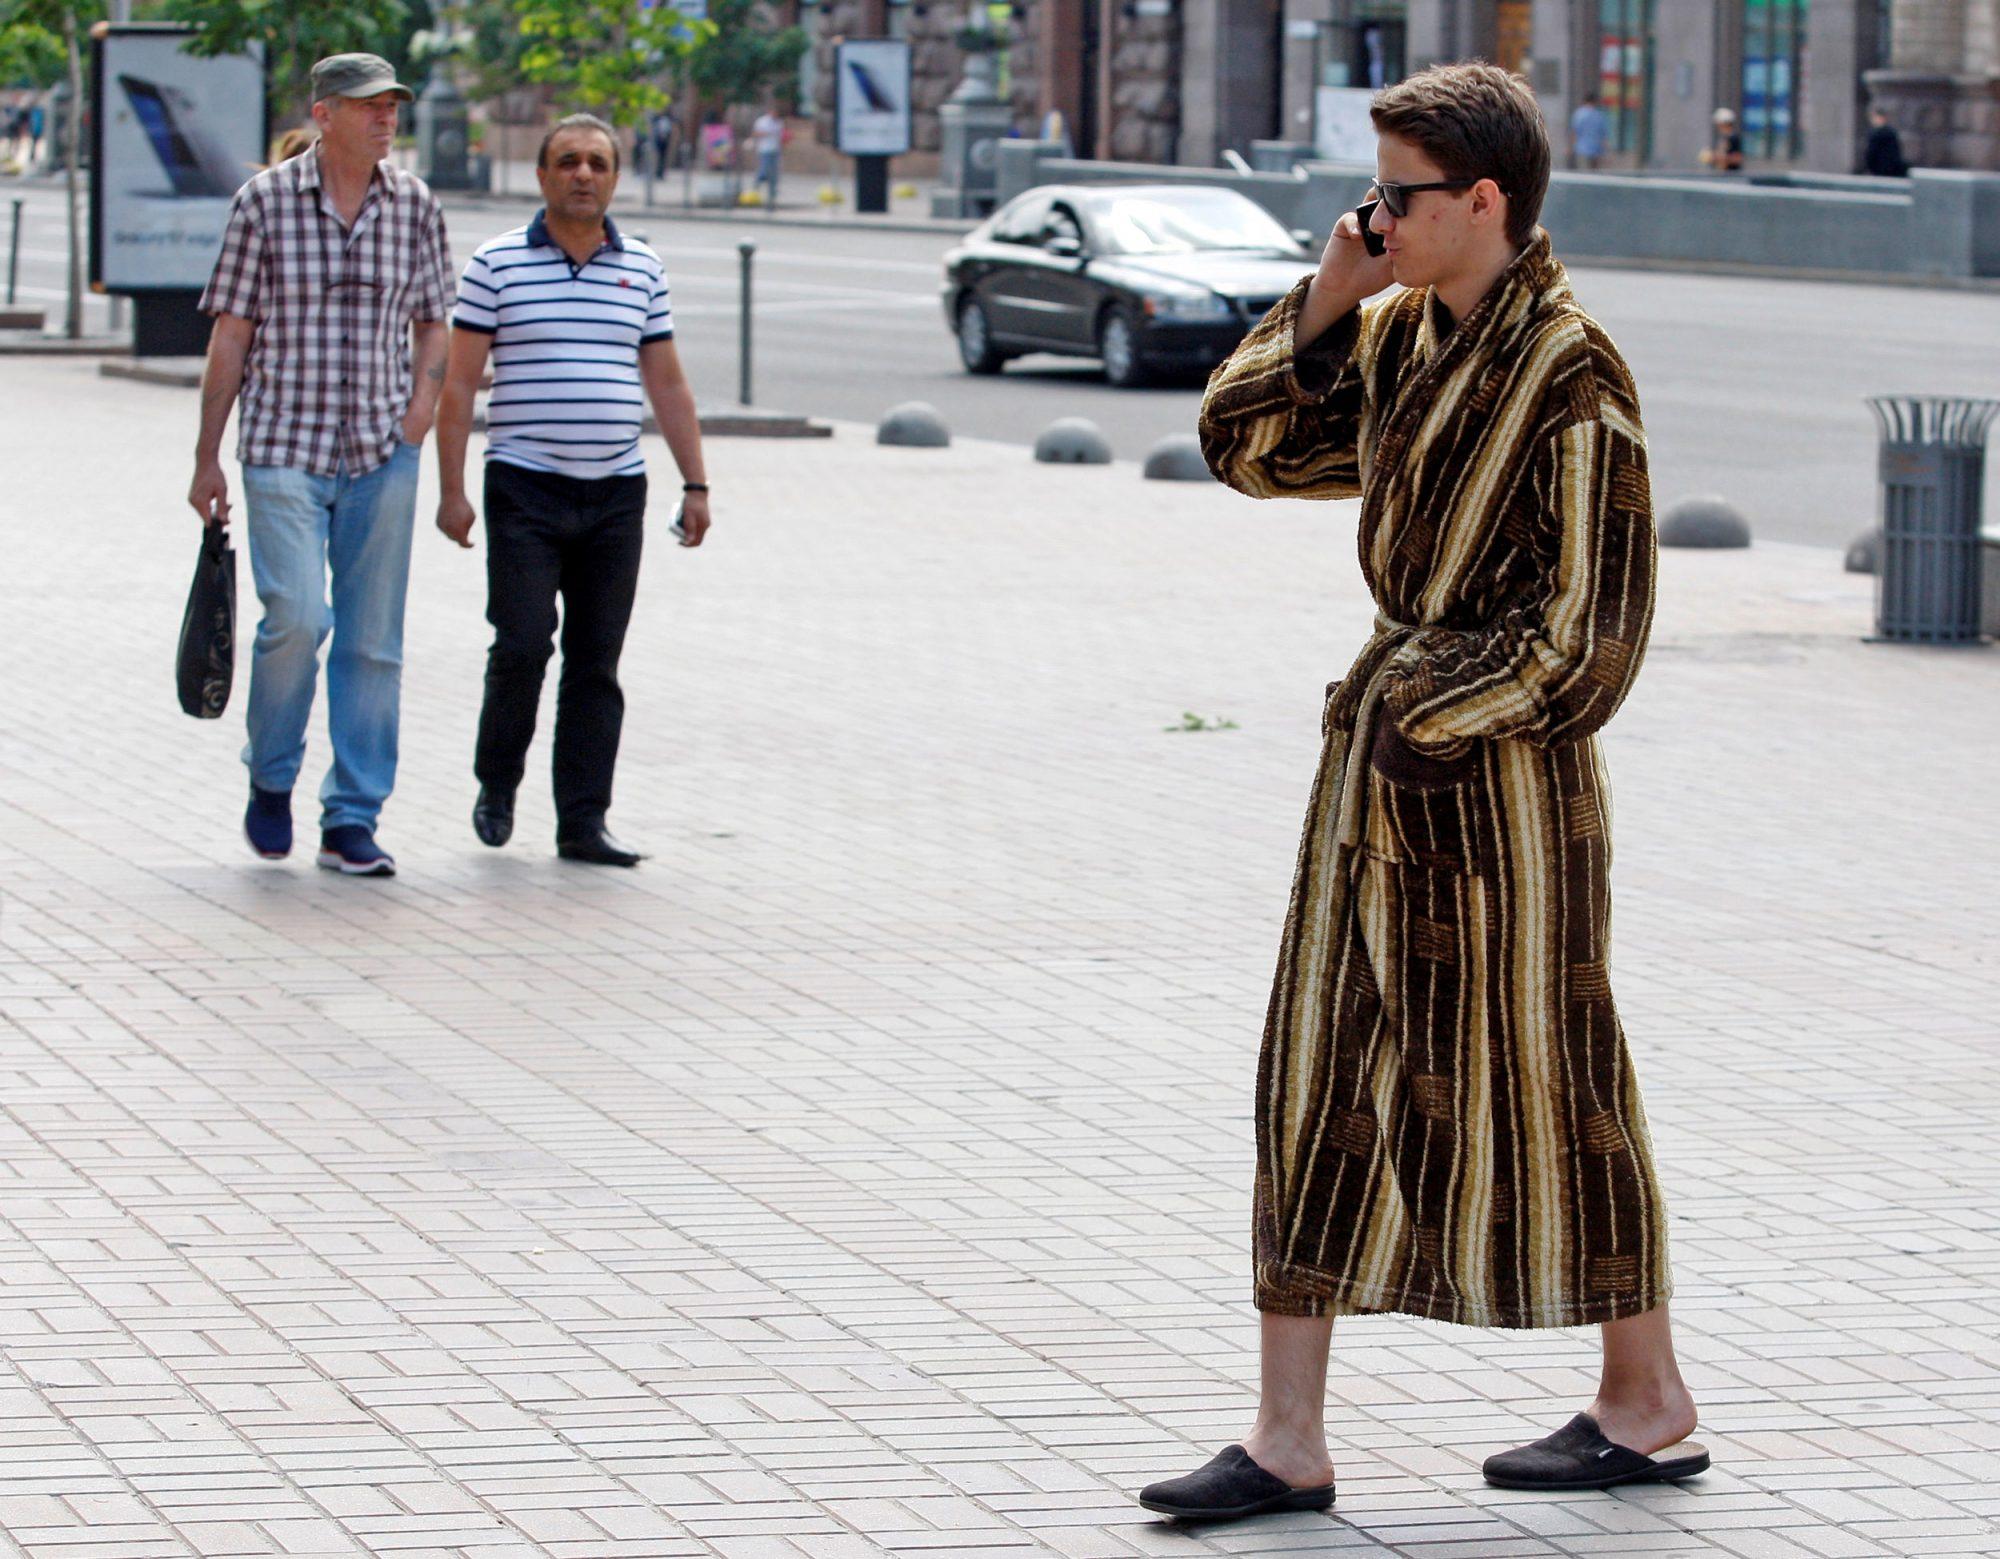 EC: Against Getting Dressed